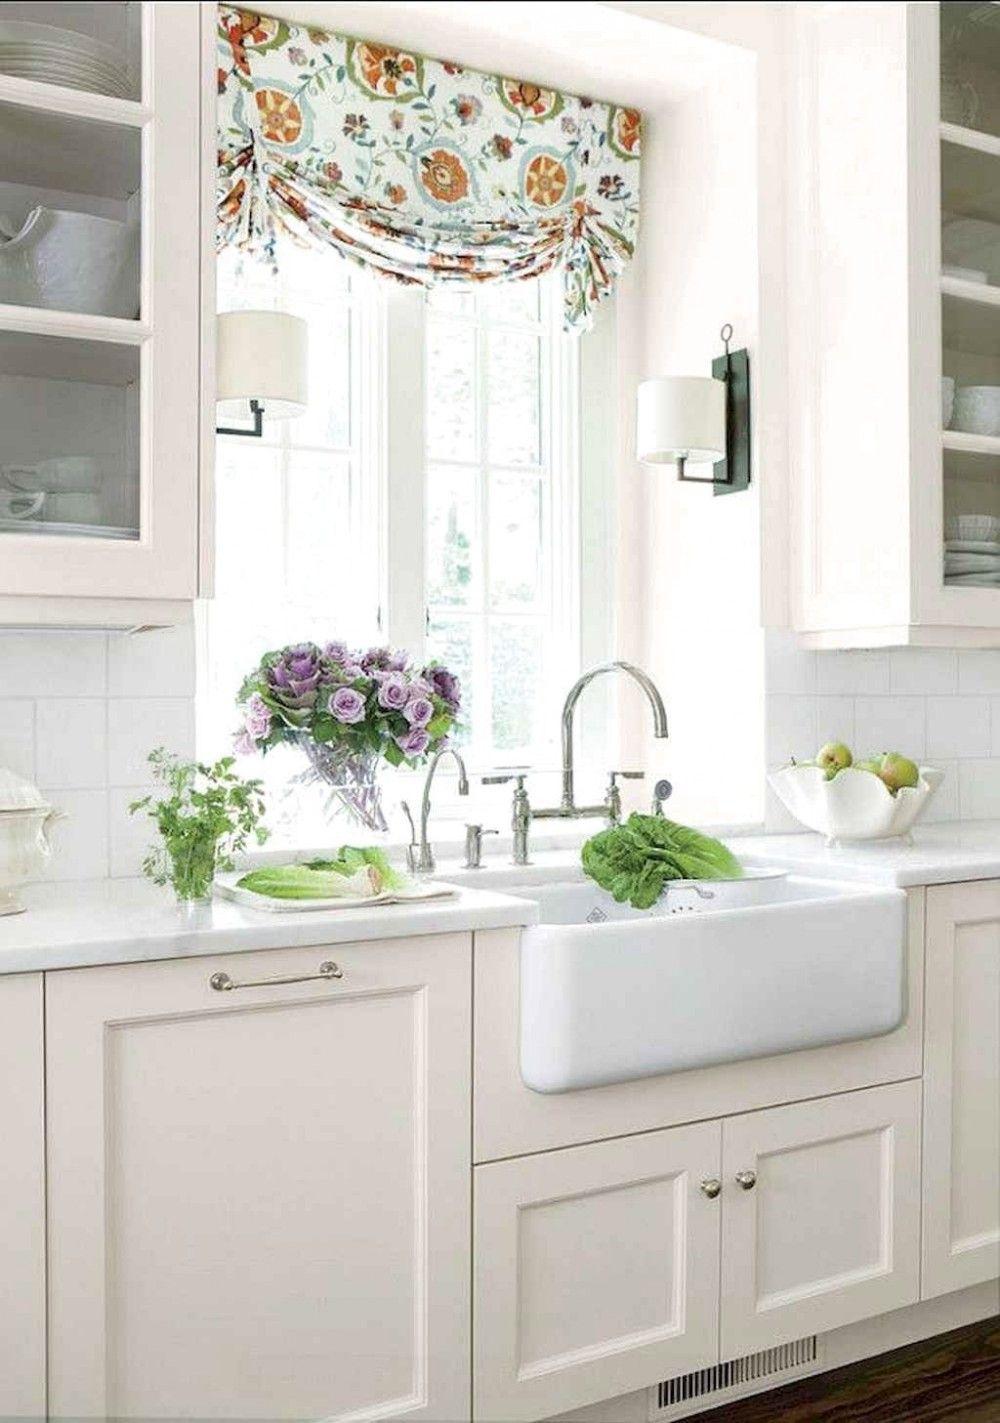 Modern Interior House Design Trend For 2020 2020 画像あり キッチンカーテン キッチン 装飾のアイデア